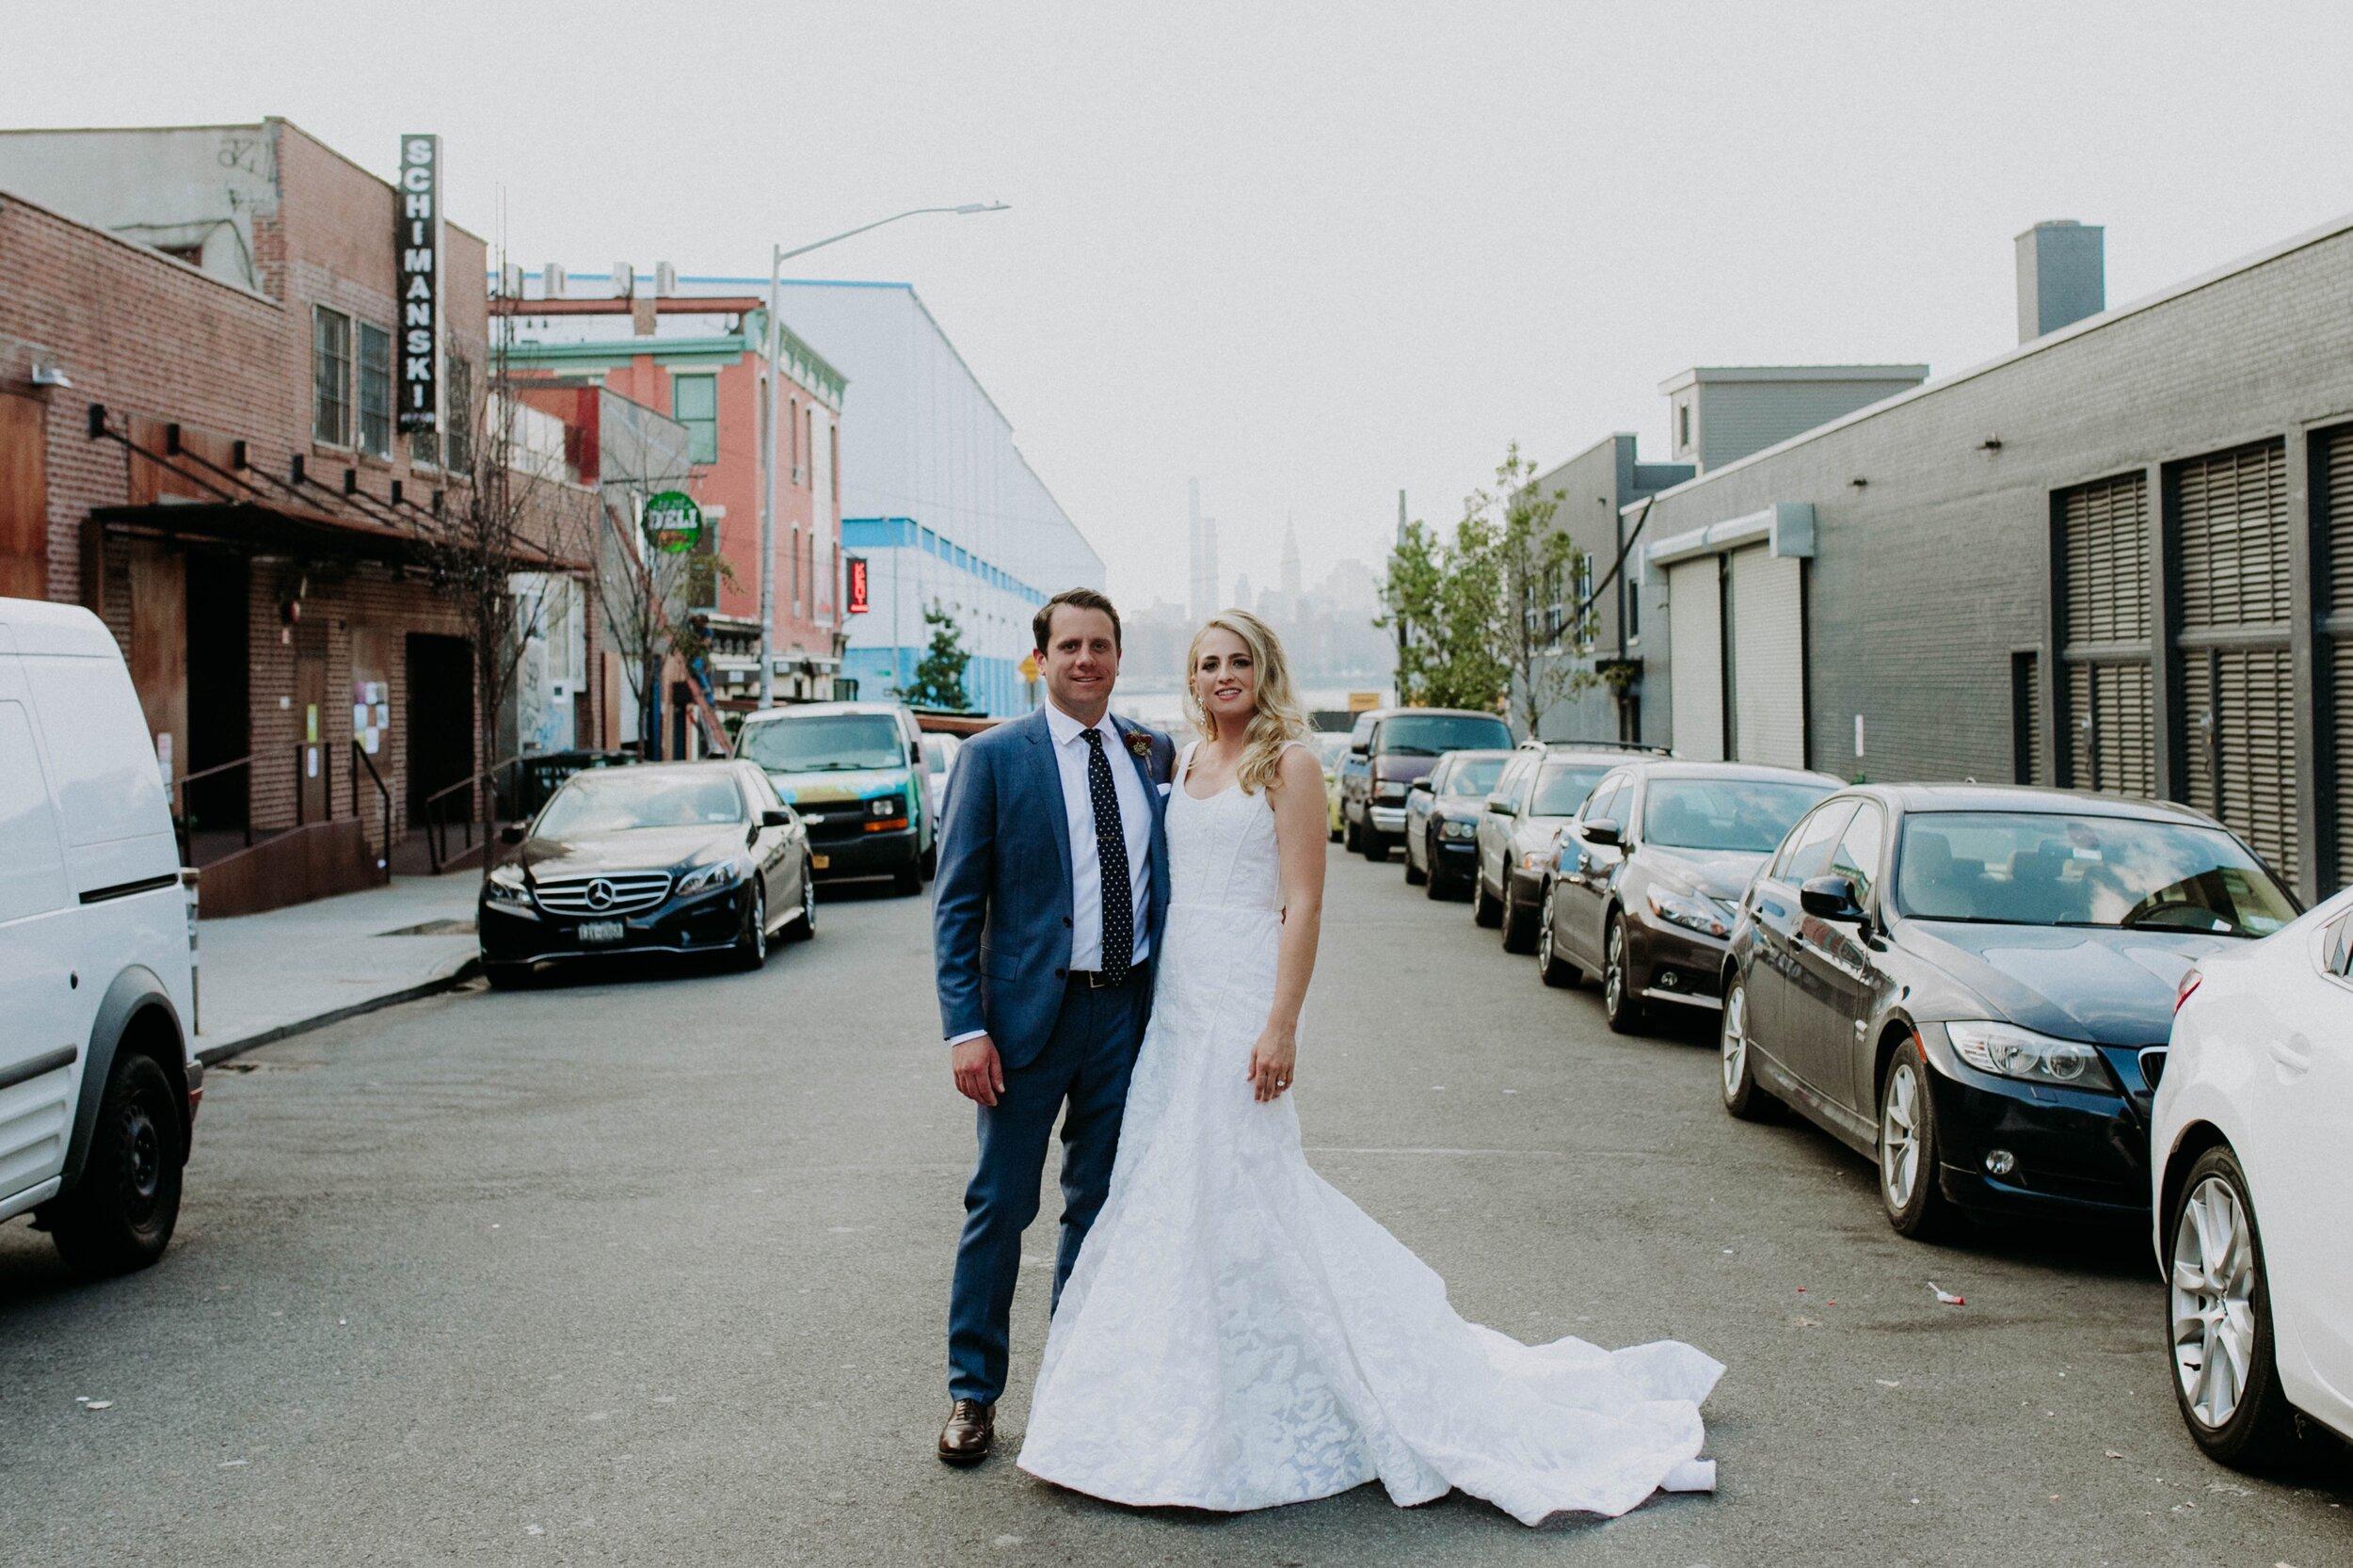 brooklyn-wedding-photographer-amber-gress-0159-.JPG